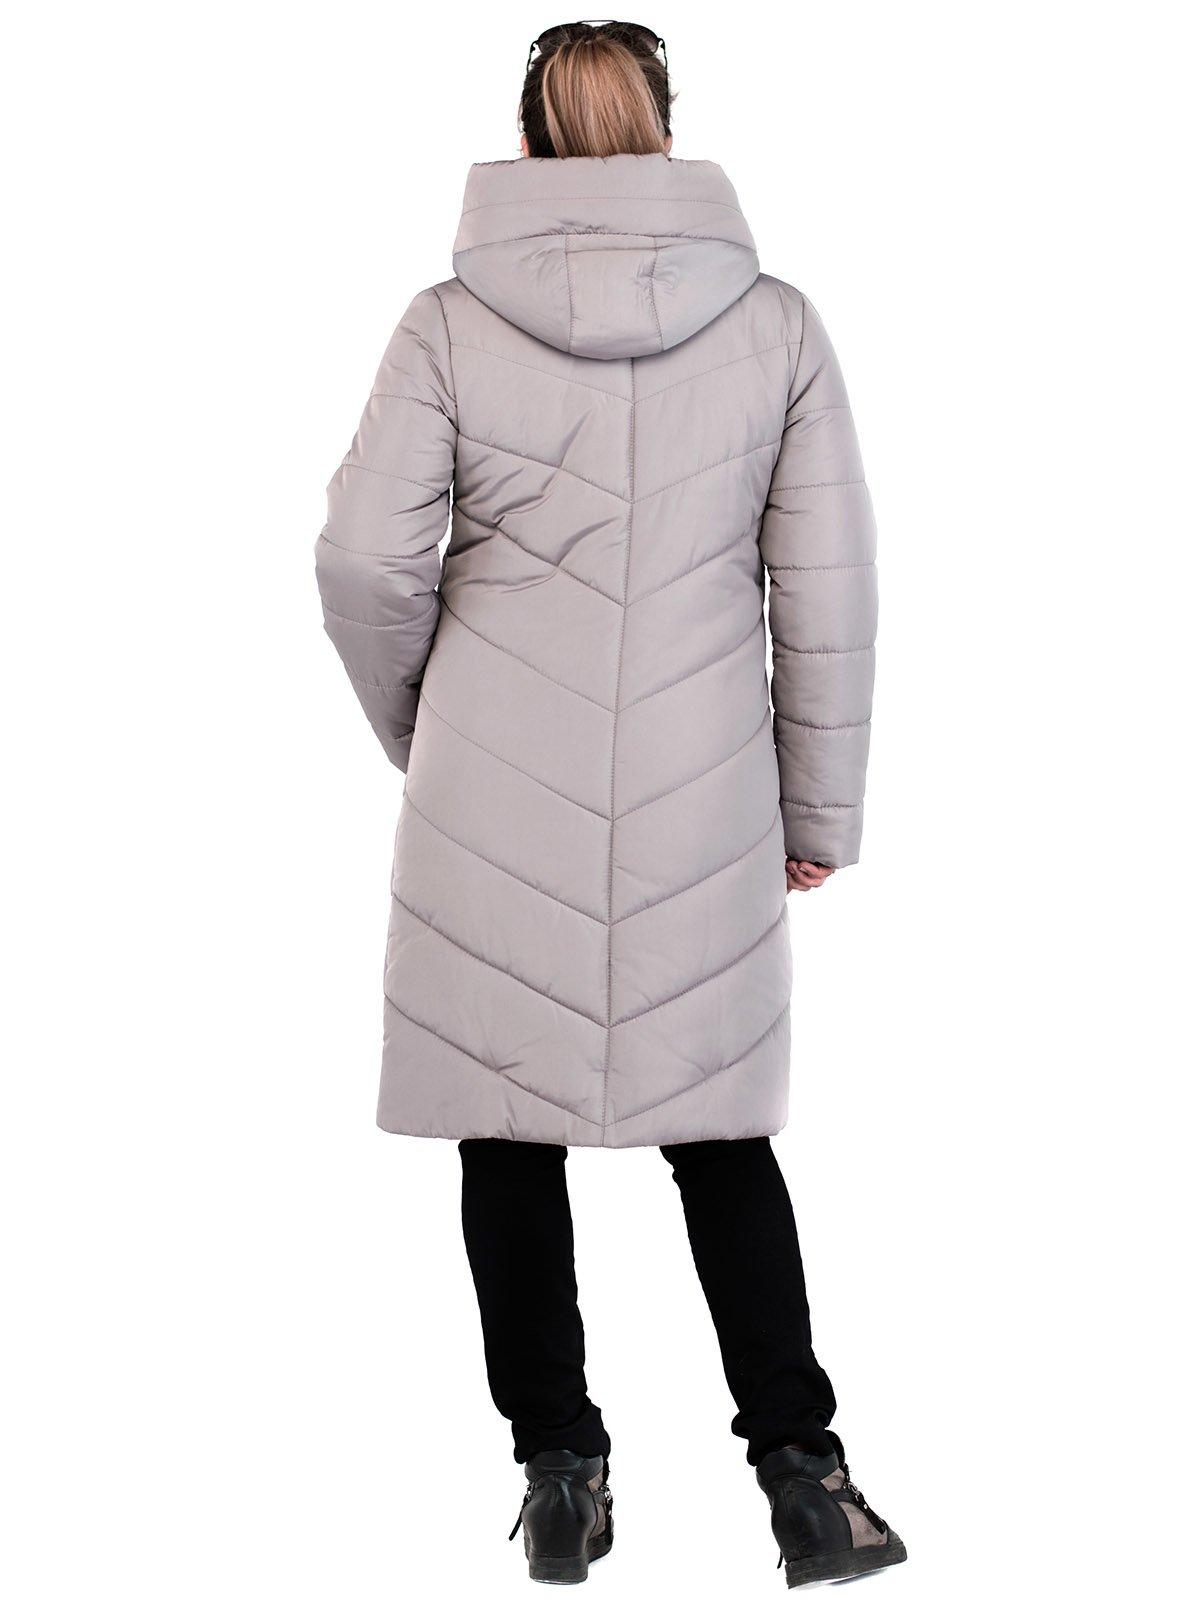 Пальто бежевое | 3750789 | фото 2